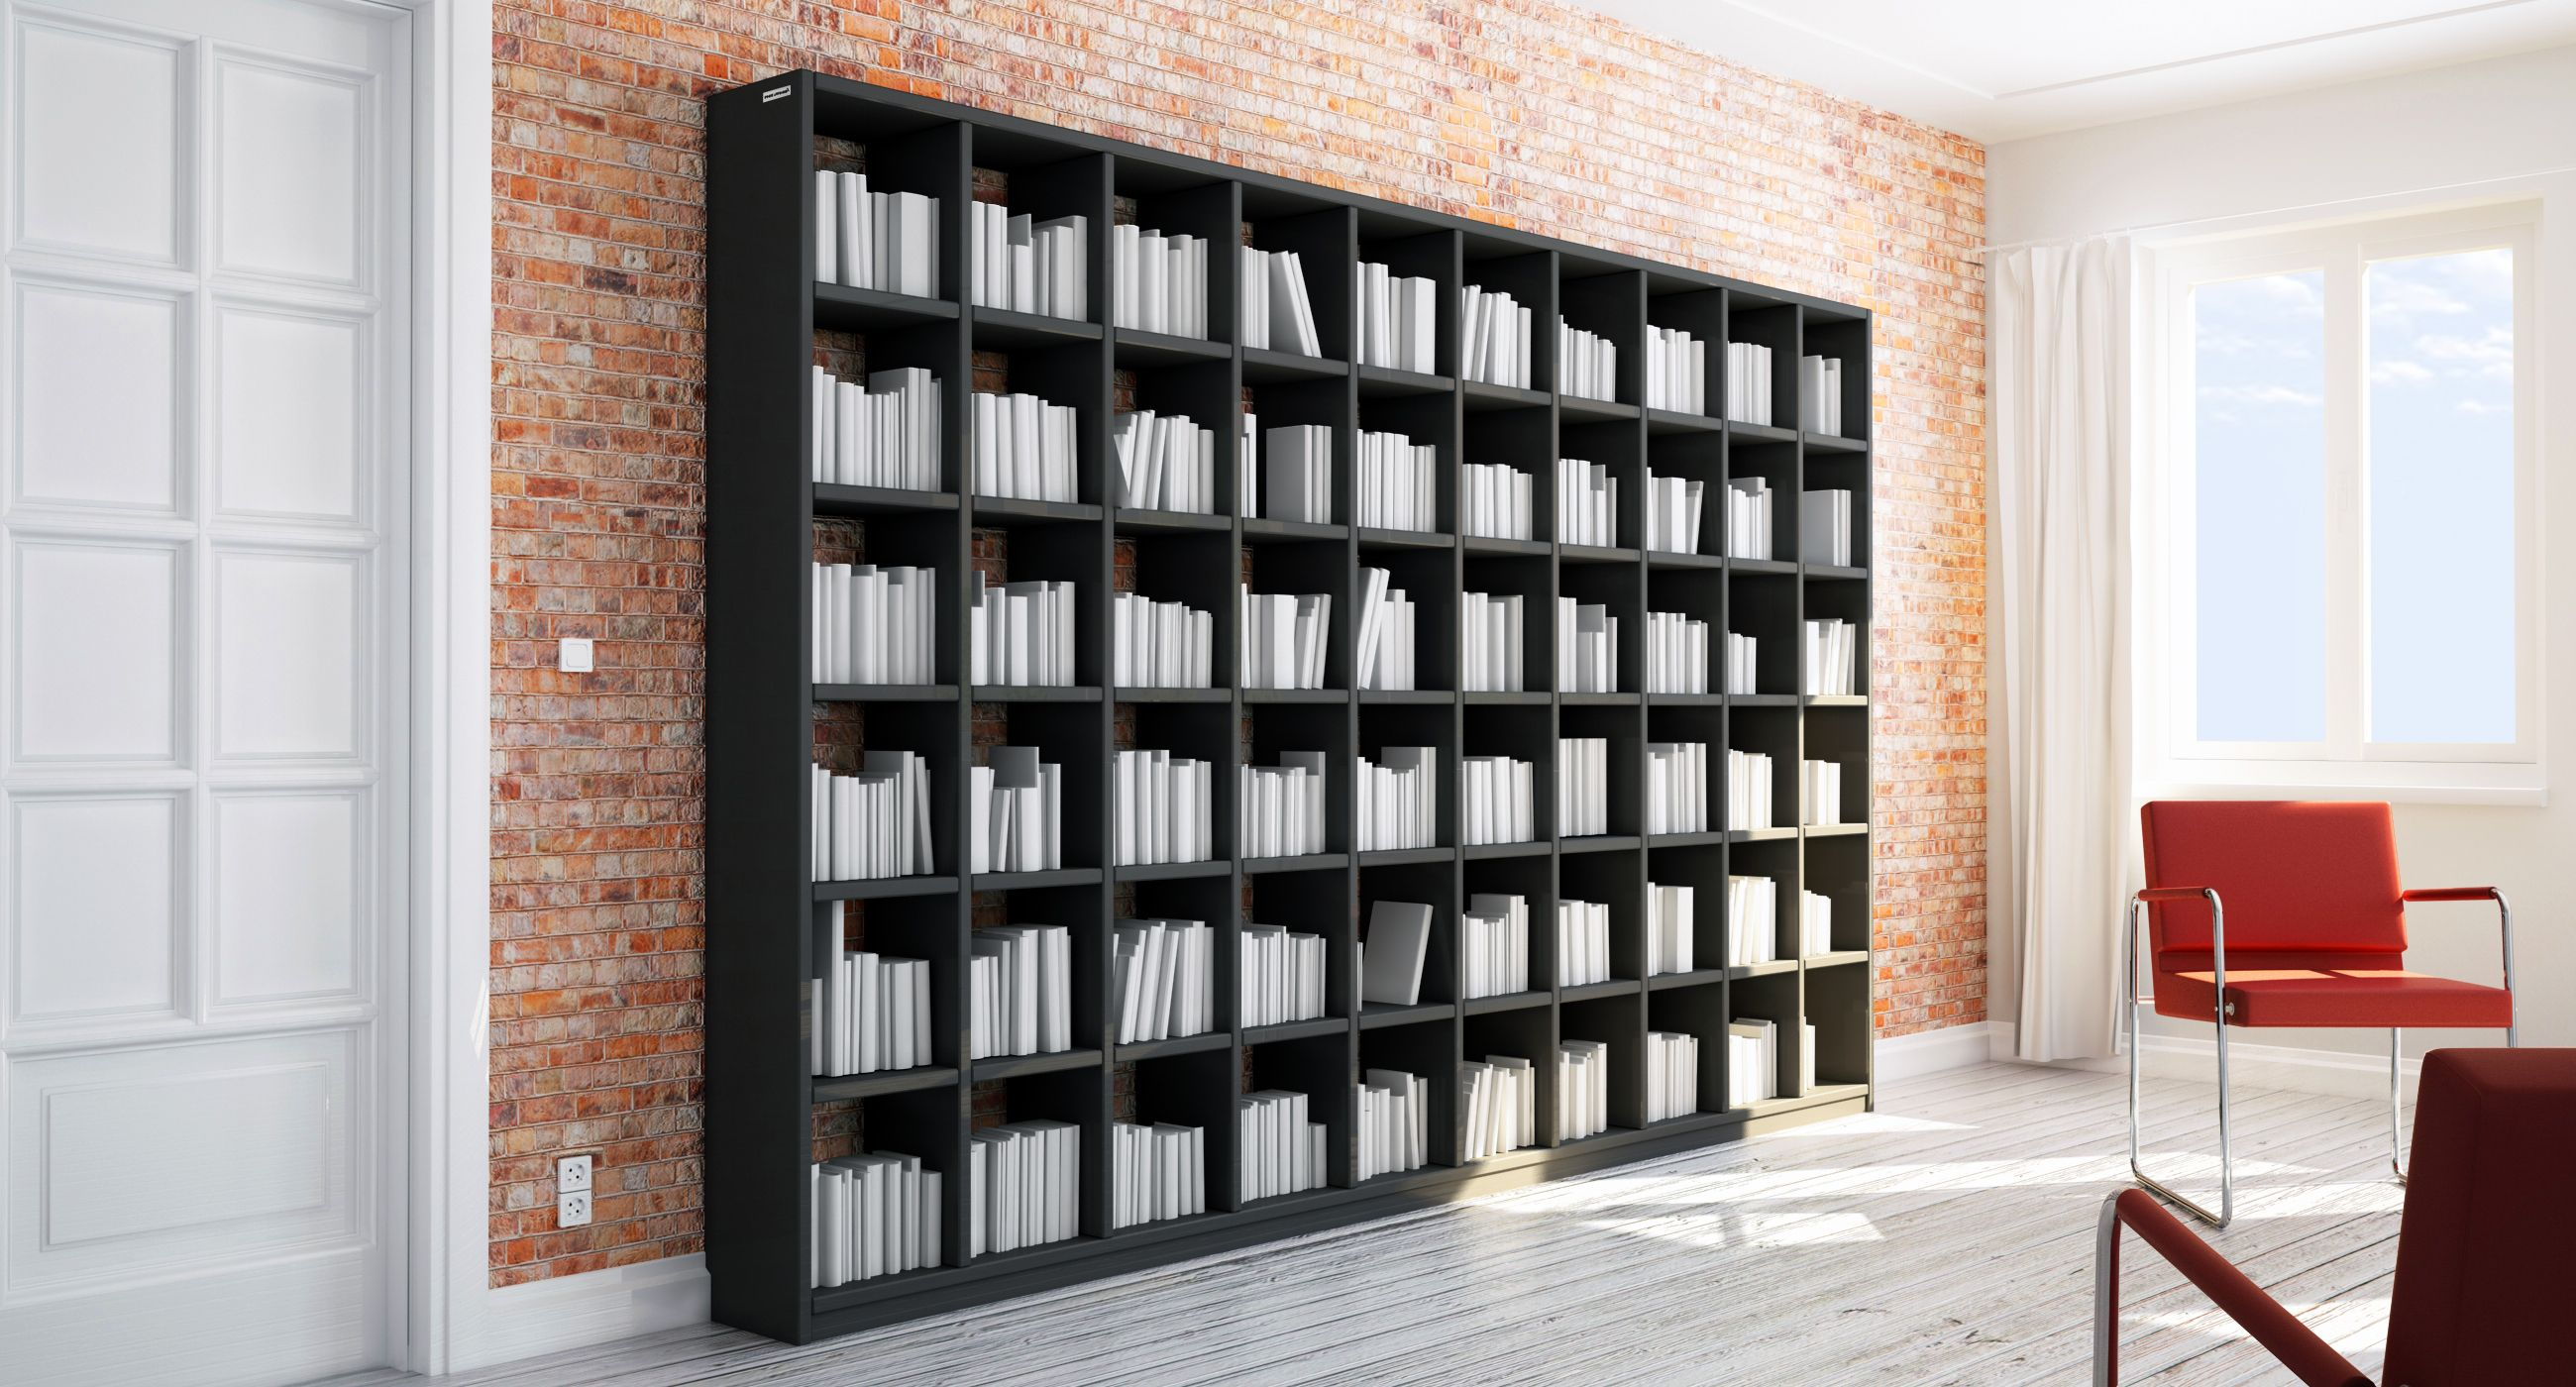 b cherregal nach ma in mdf holz schwarz alle ma e wie. Black Bedroom Furniture Sets. Home Design Ideas